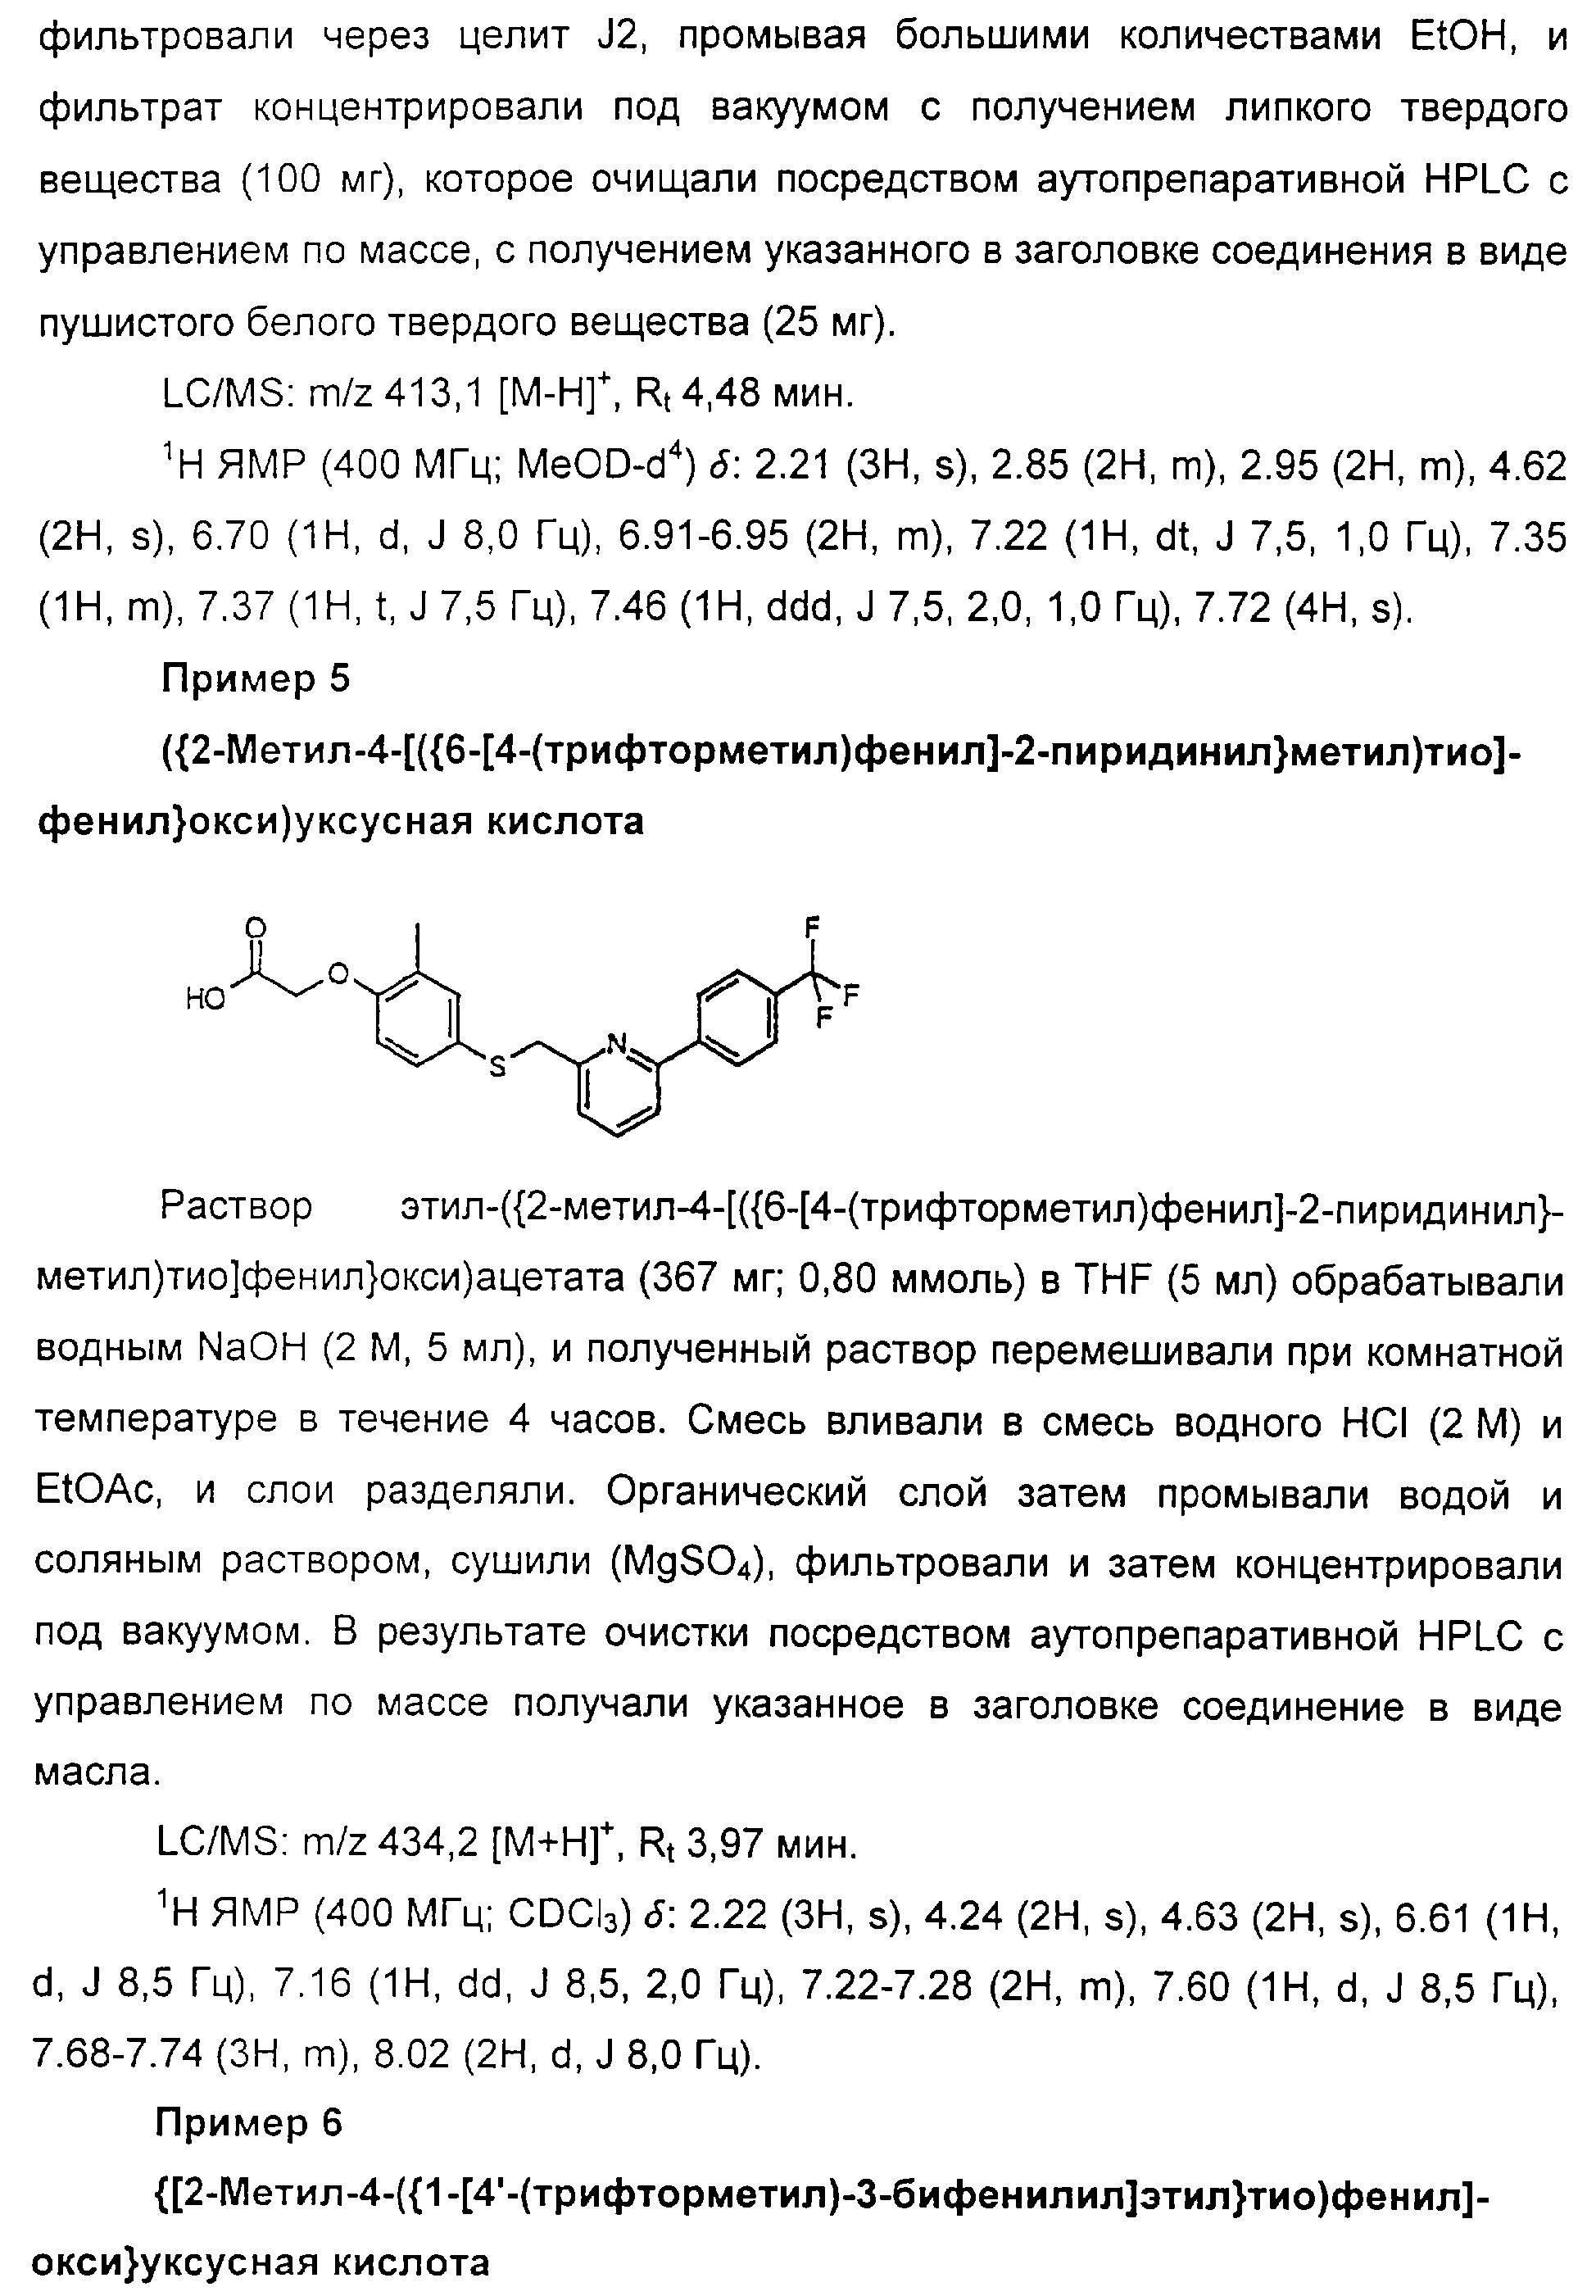 Figure 00000103